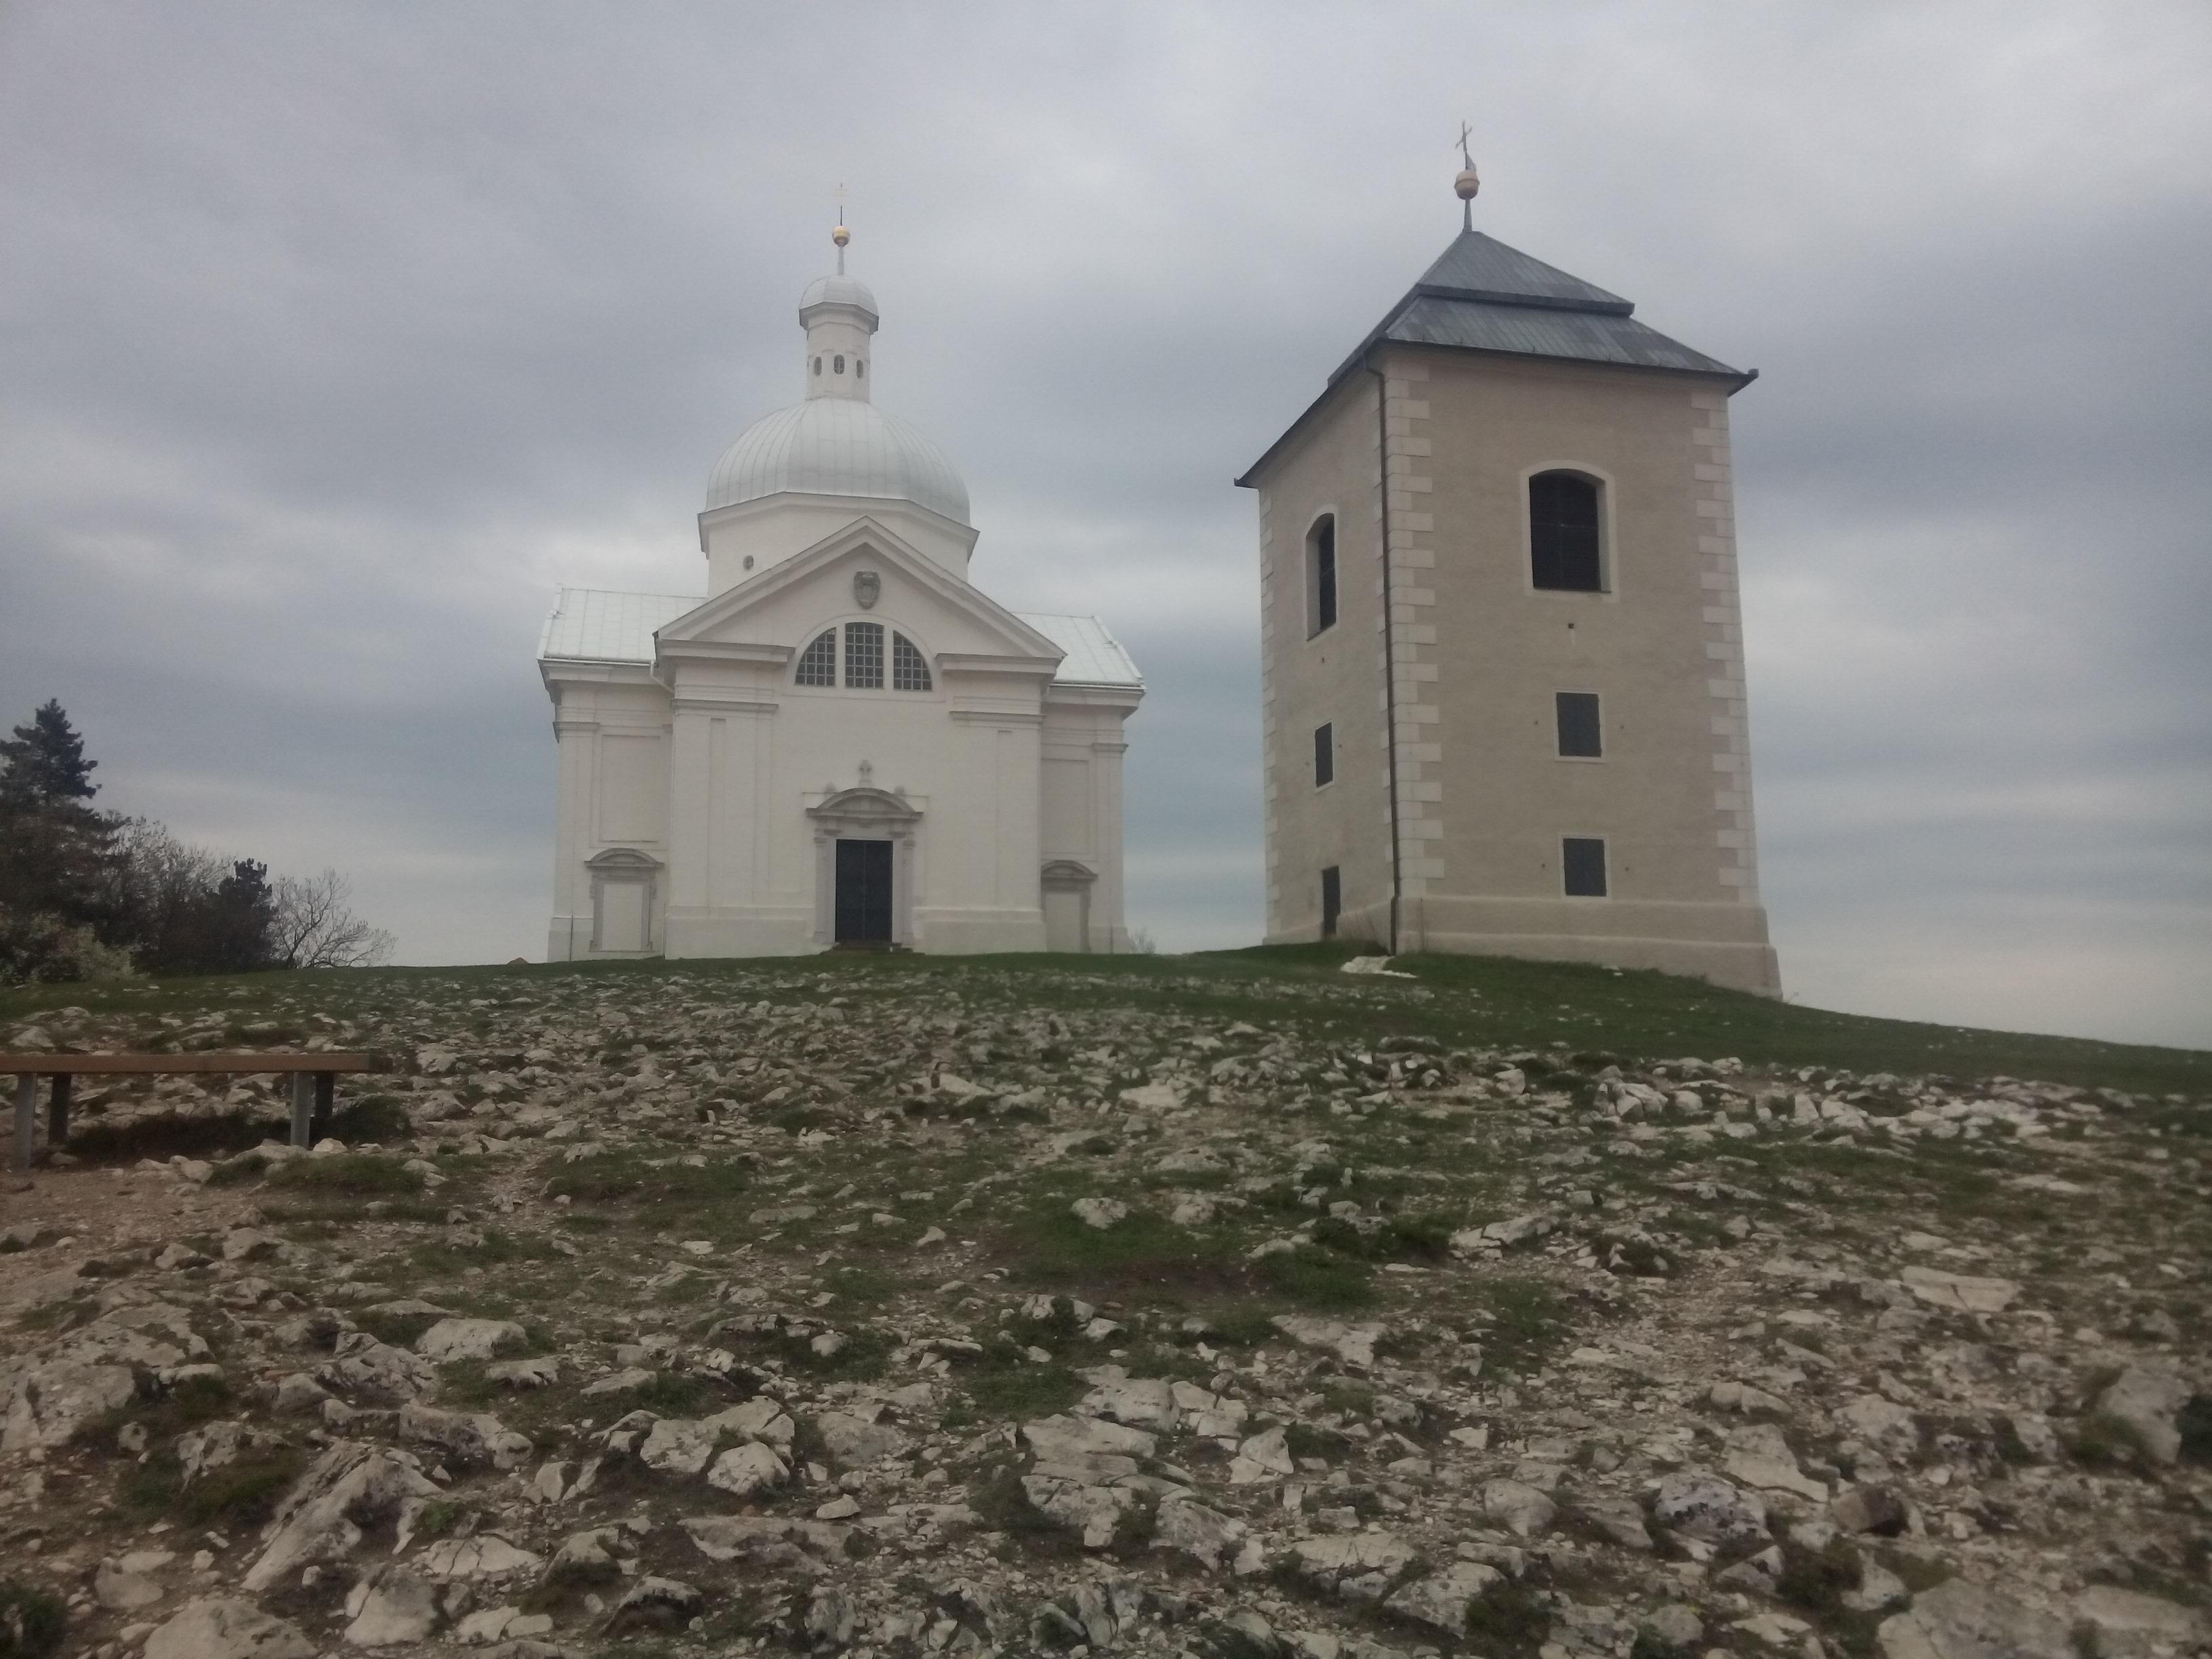 https://i.amy.gy/201804-slovakia-austria-czech/IMG_20180416_185054.jpg